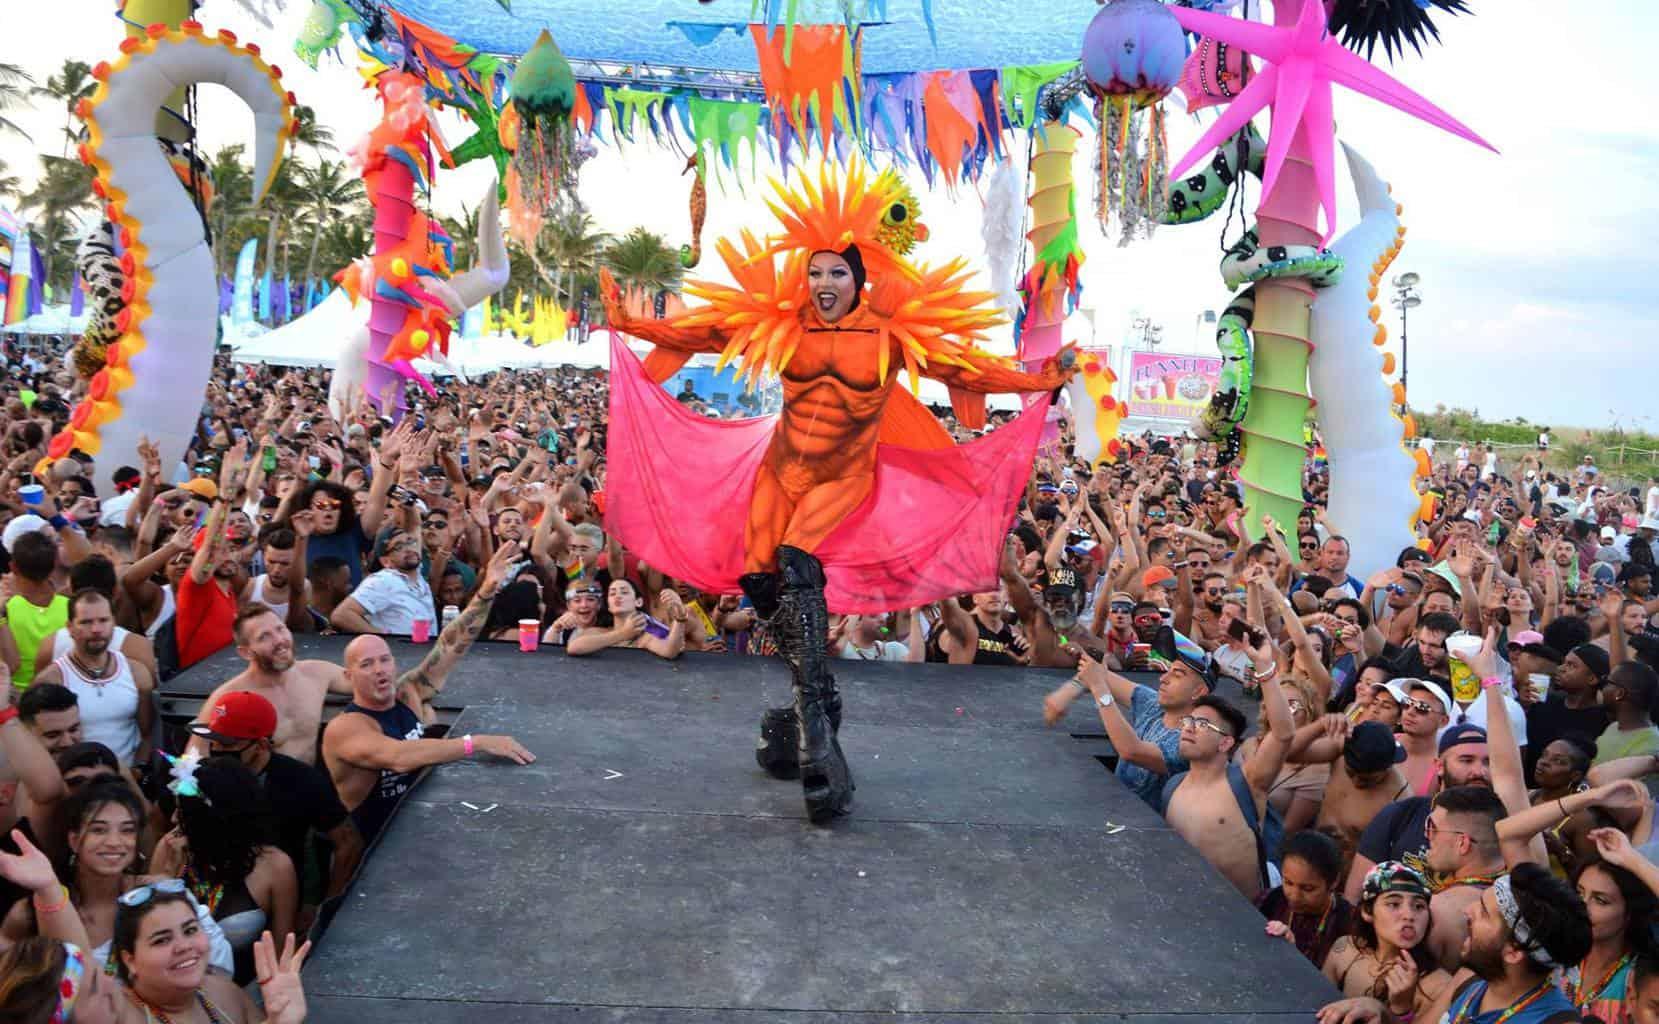 Miami Gay Dance Clubs